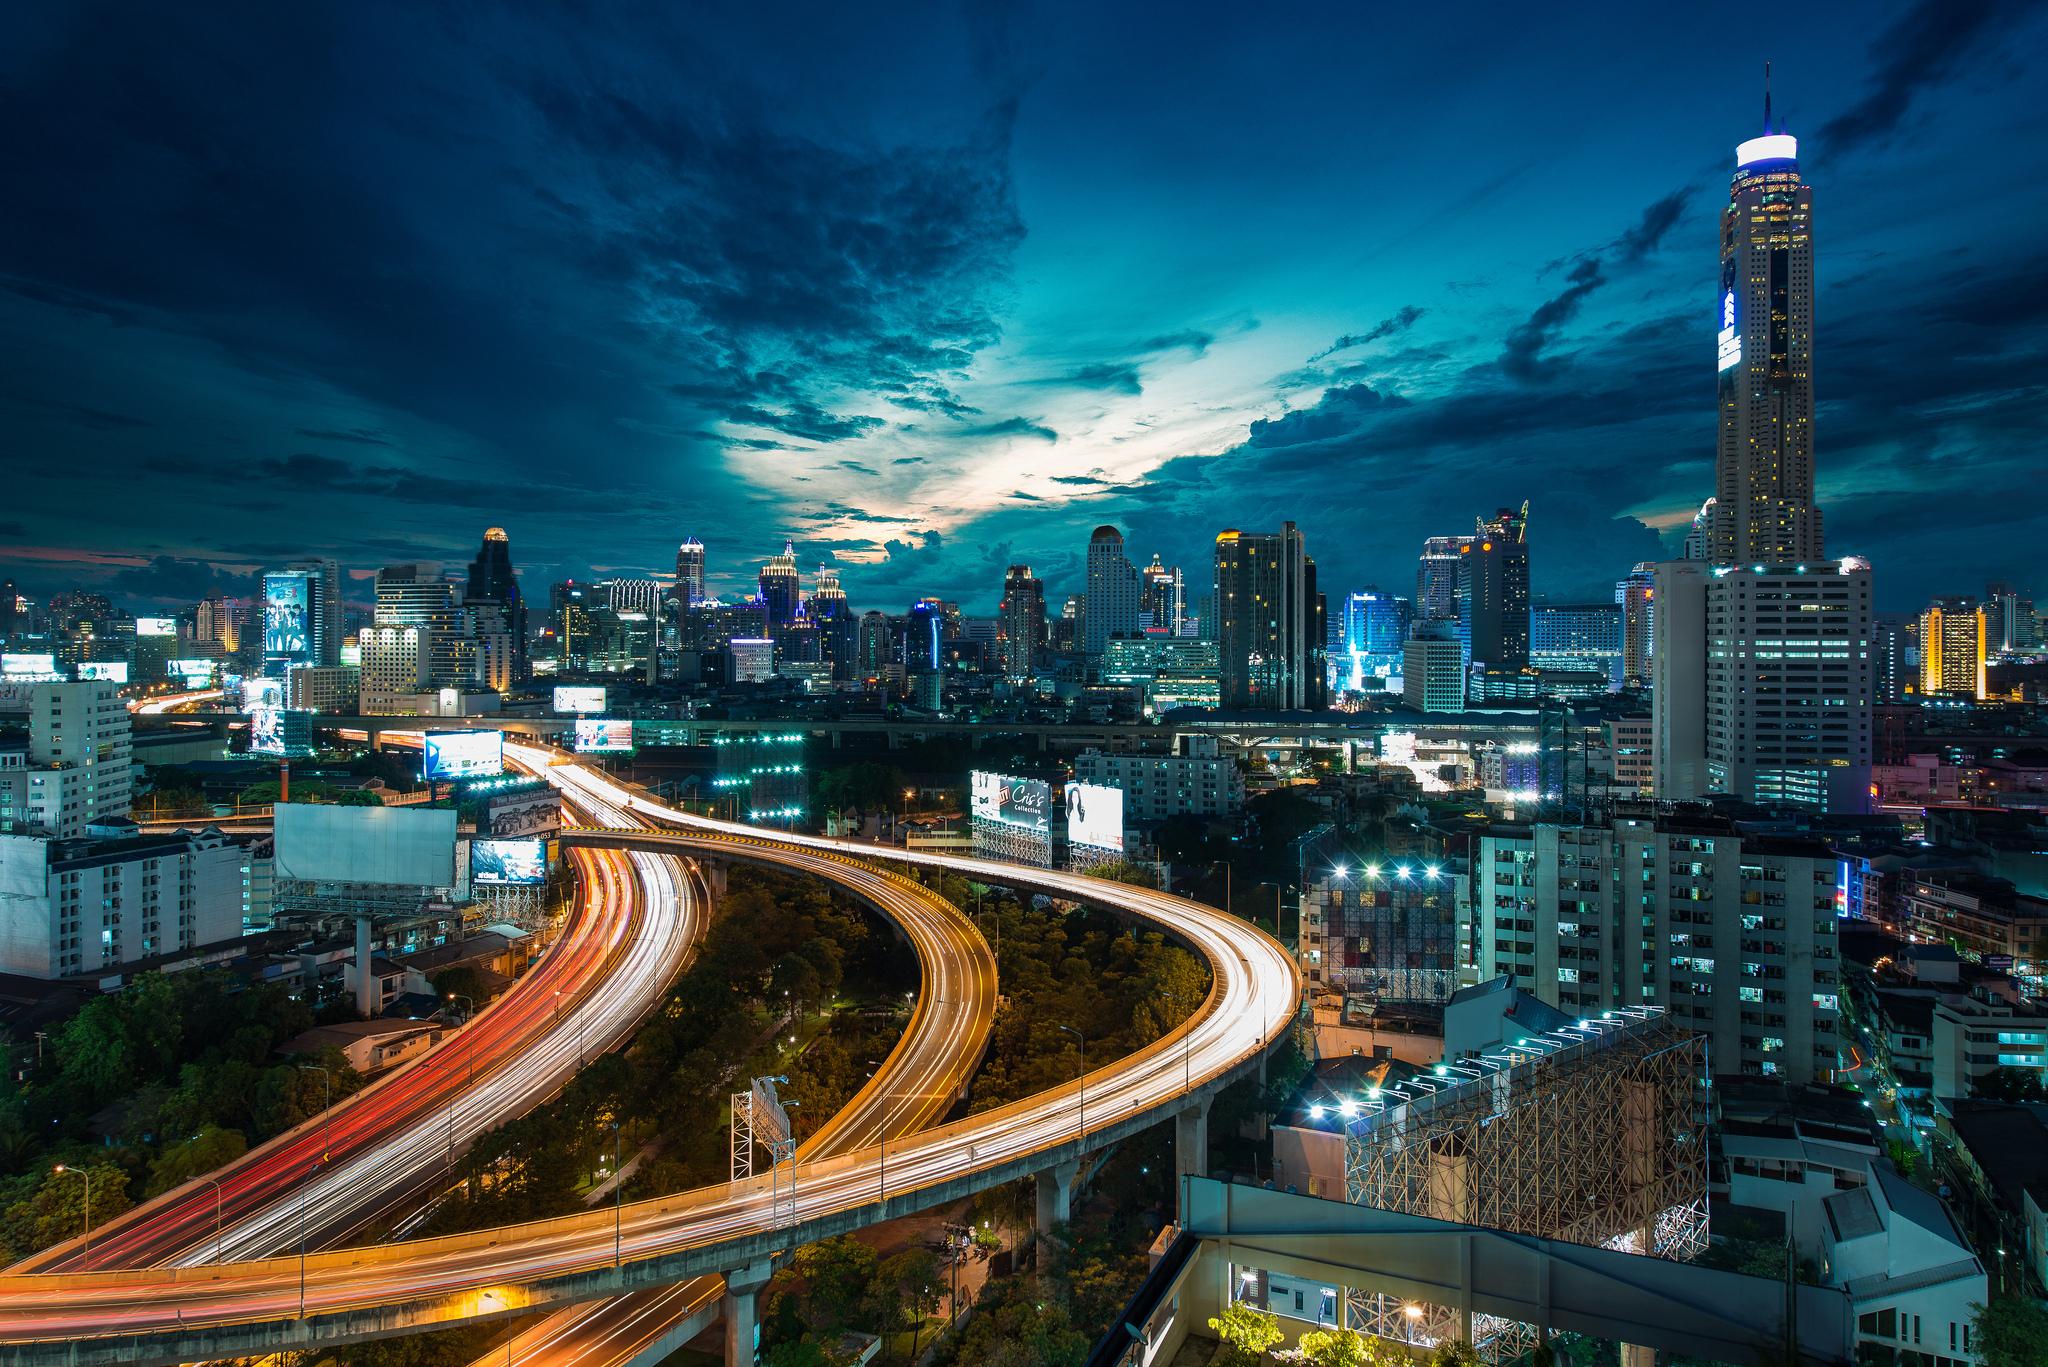 страны архитектура Бангкок Таиланд ночь  № 2195080 загрузить